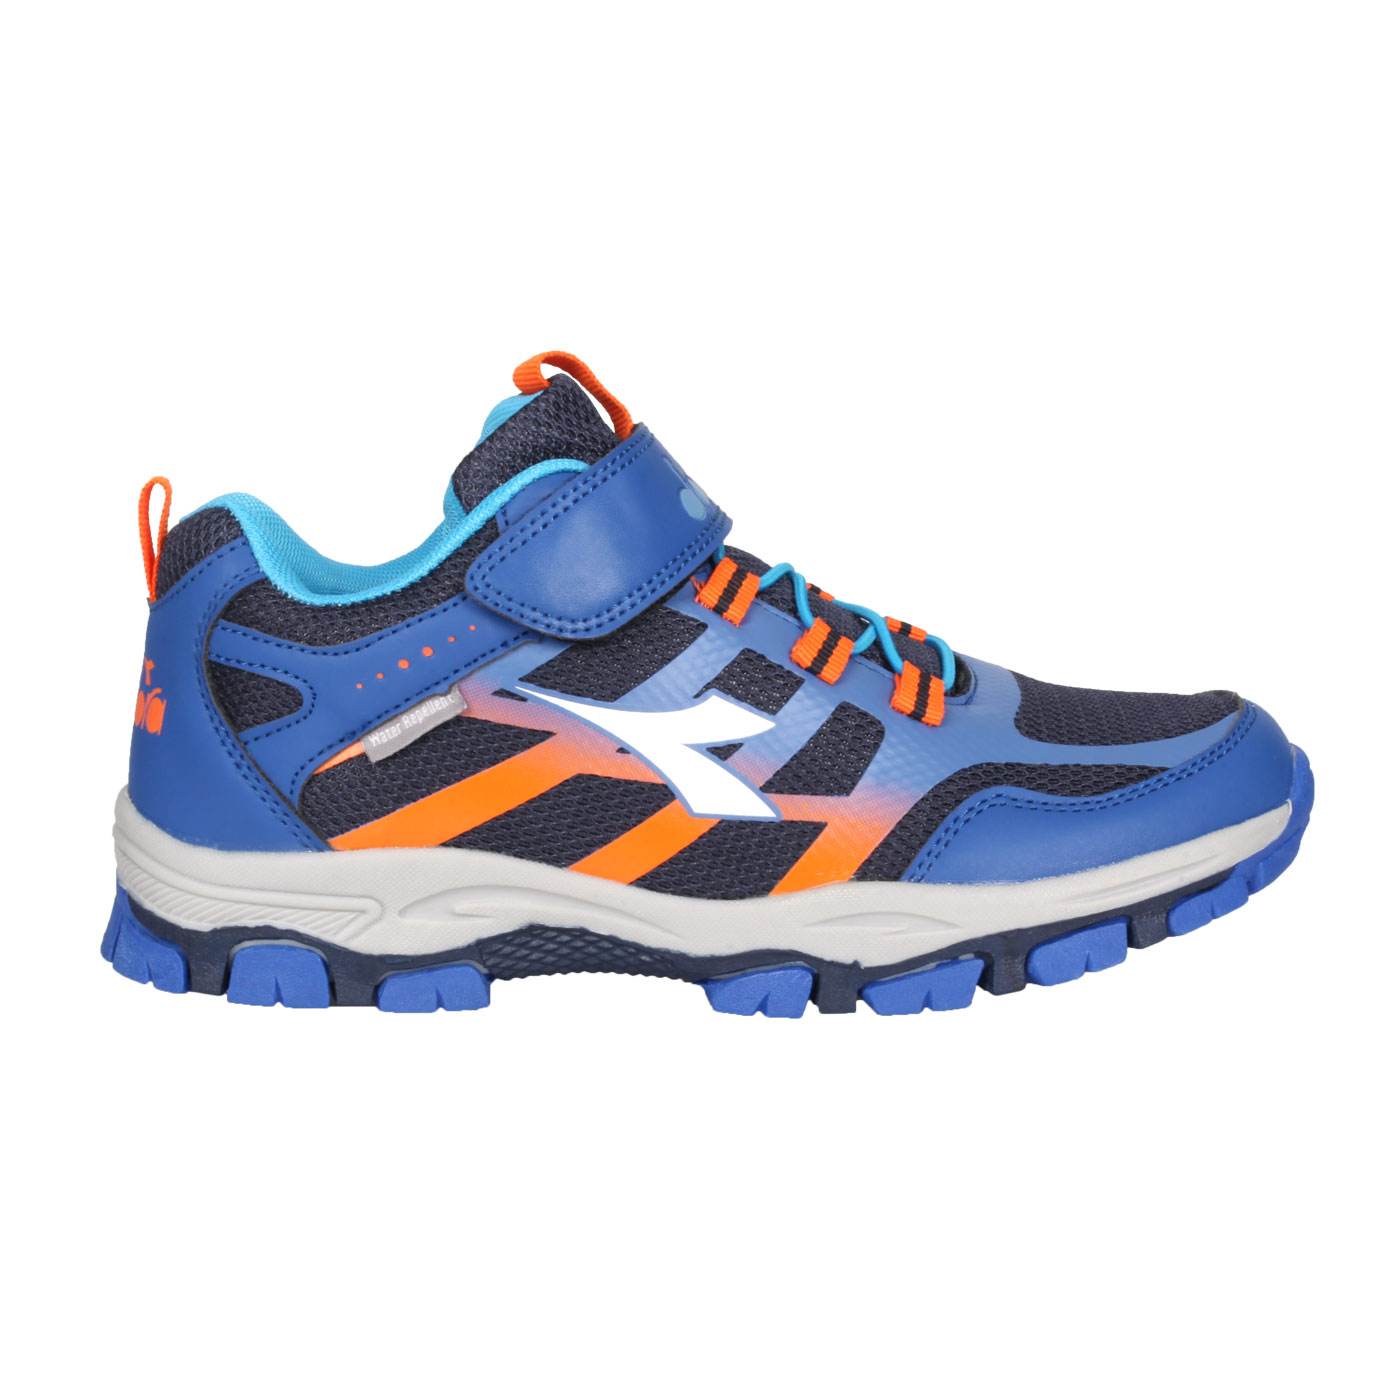 DIADORA 大童戶外野趣越野鞋-超寬楦 DA13035 - 藍白橘